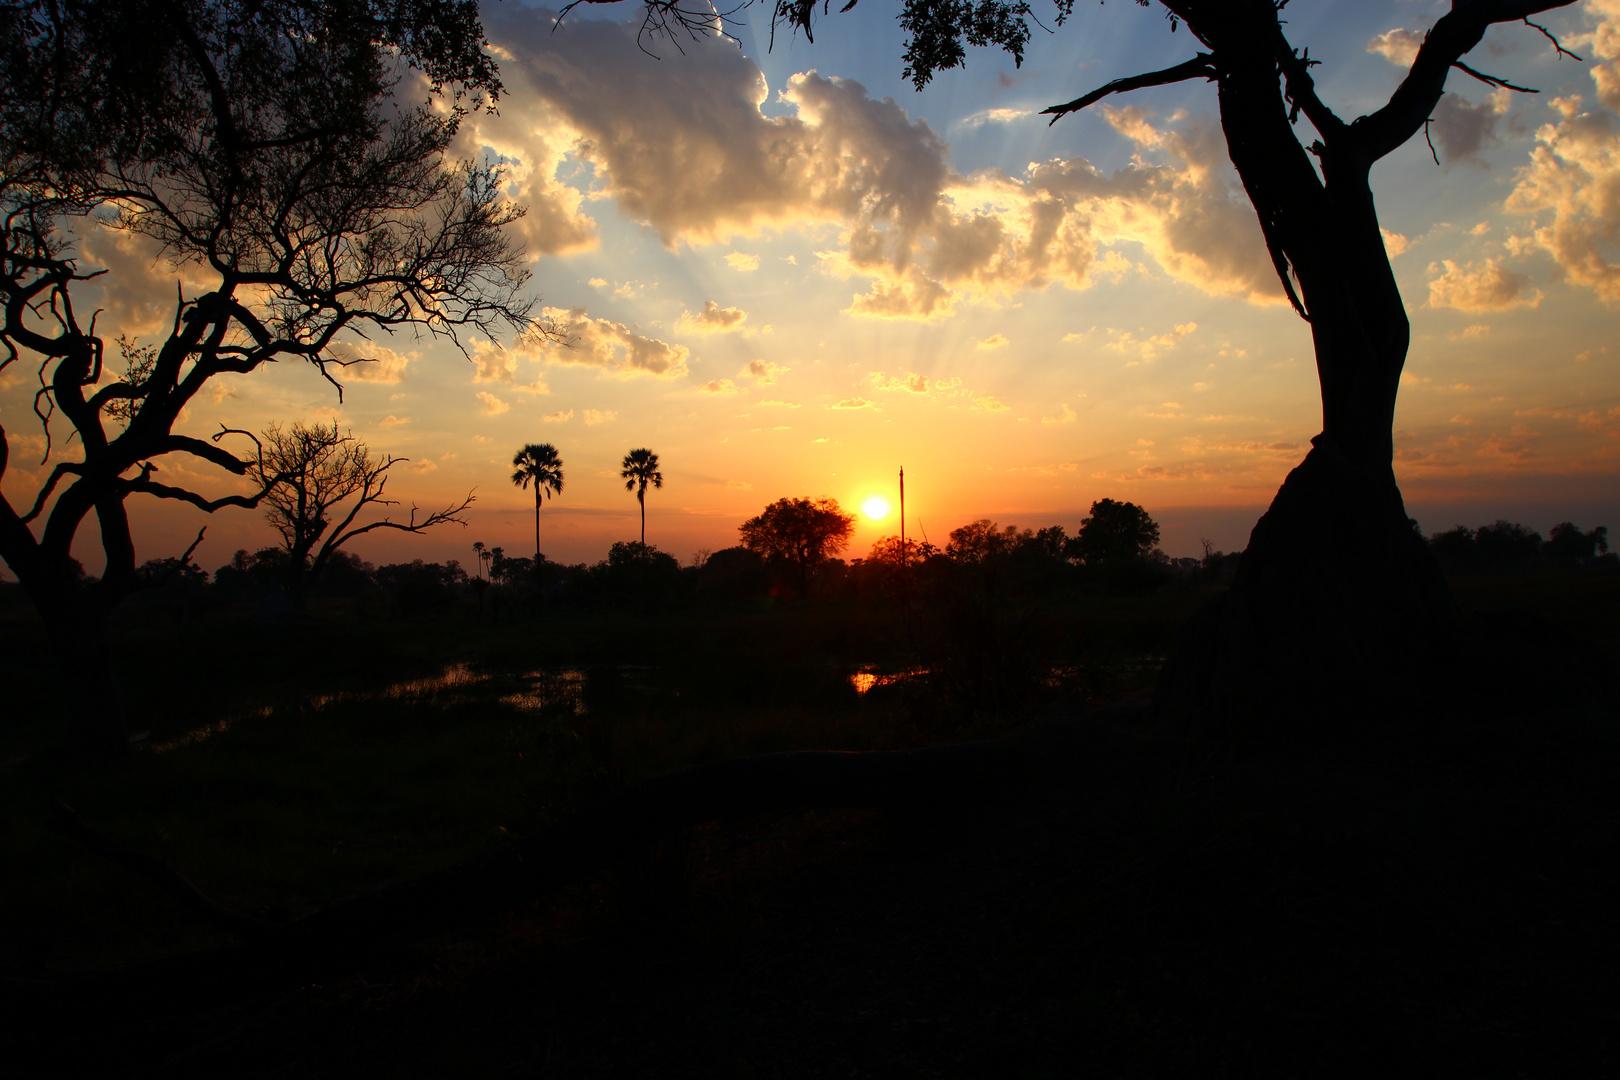 Sonnenaufgang im Okawango-Delta